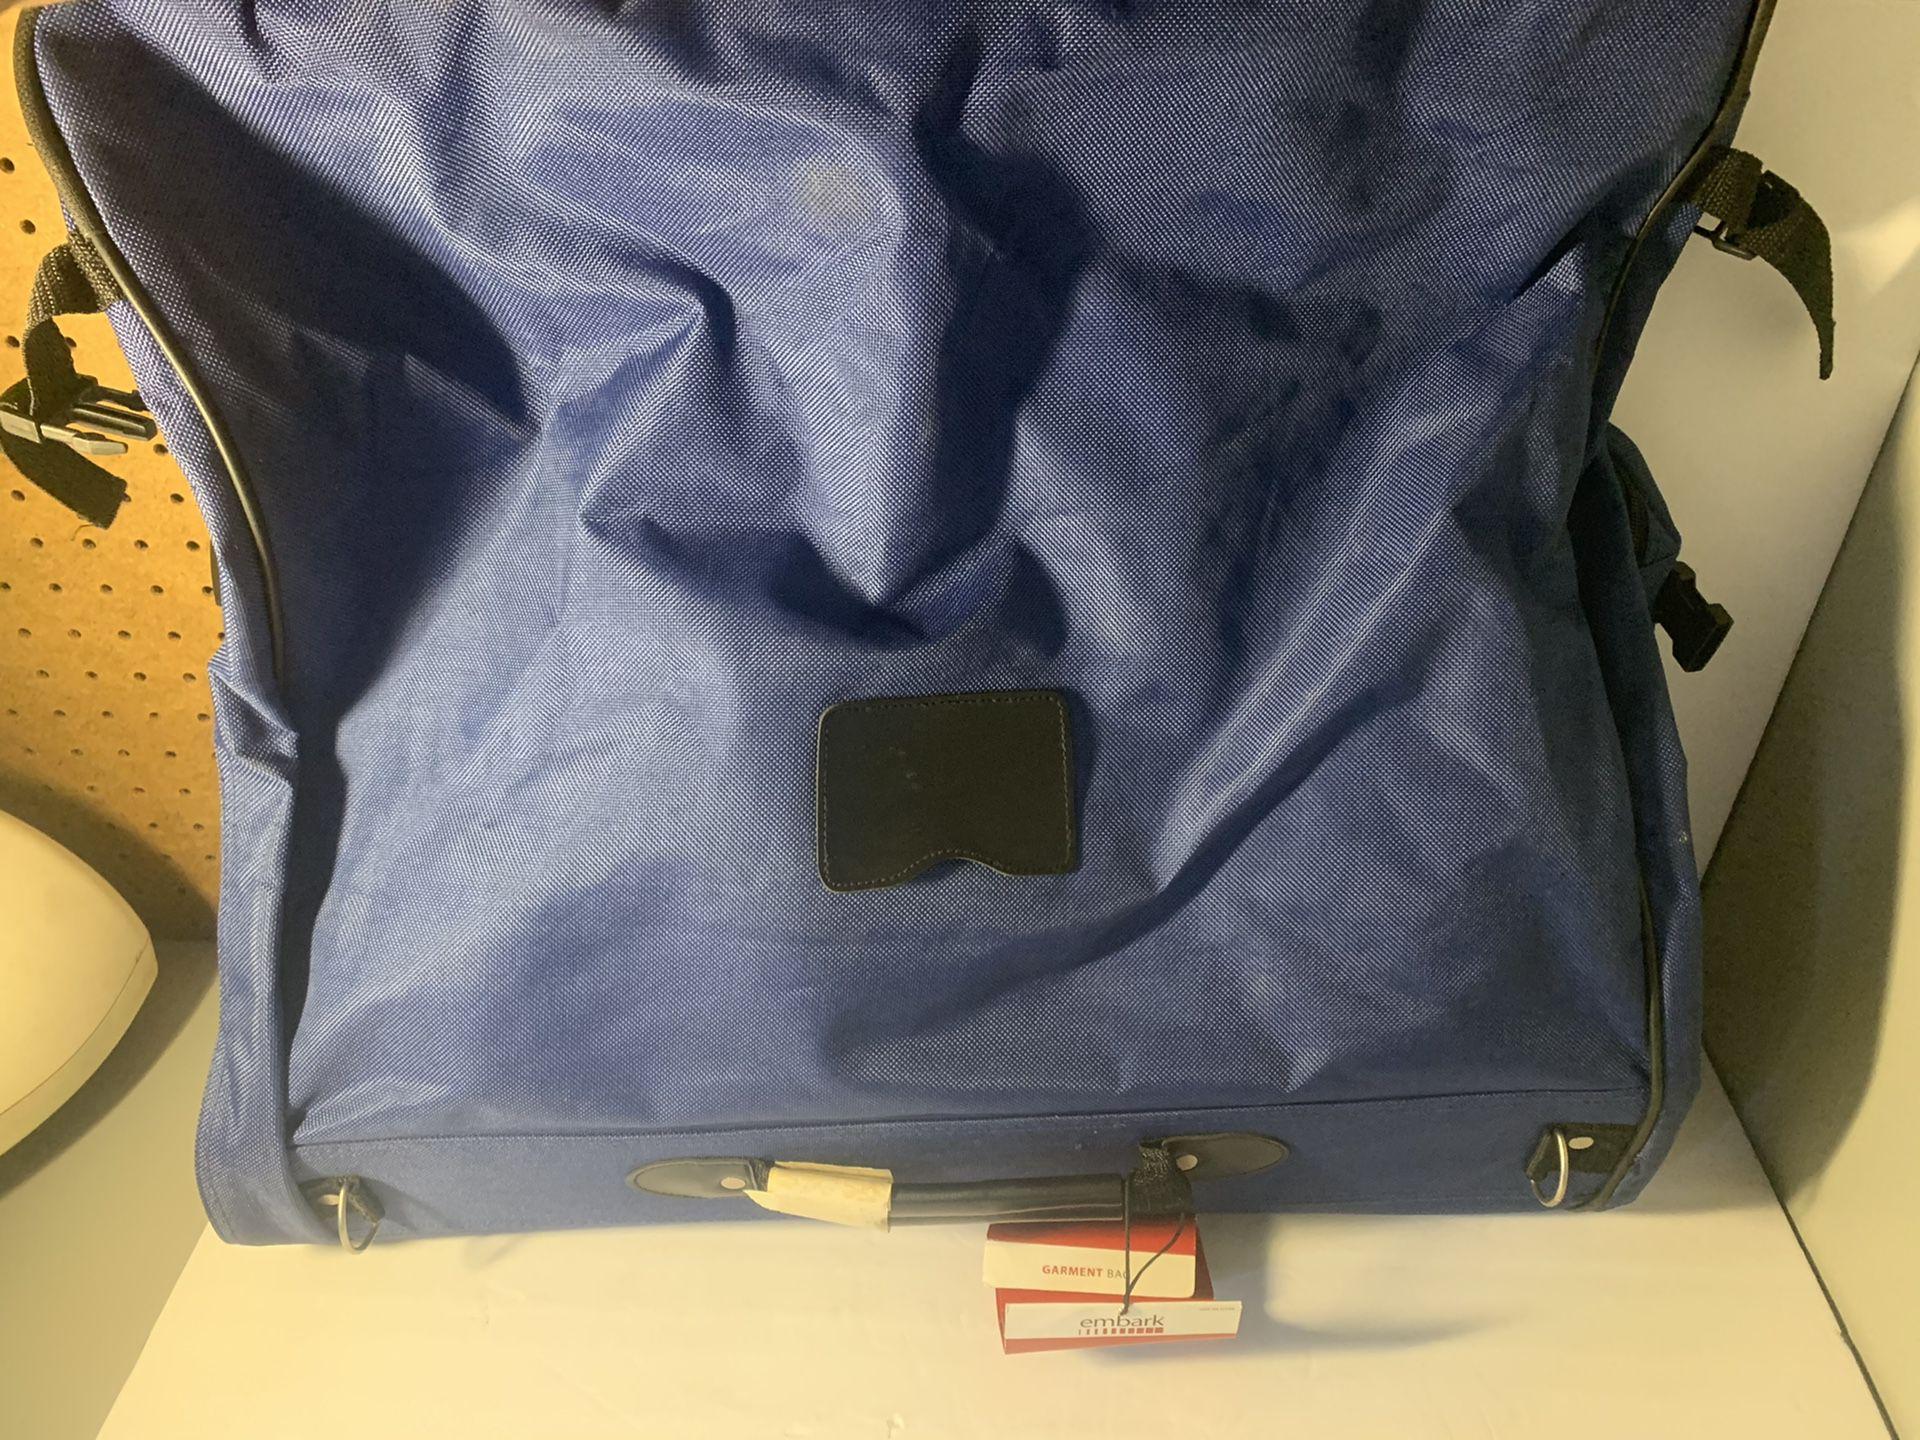 Embark Light Weight Carry-On Garment Bag for Flights Brand New